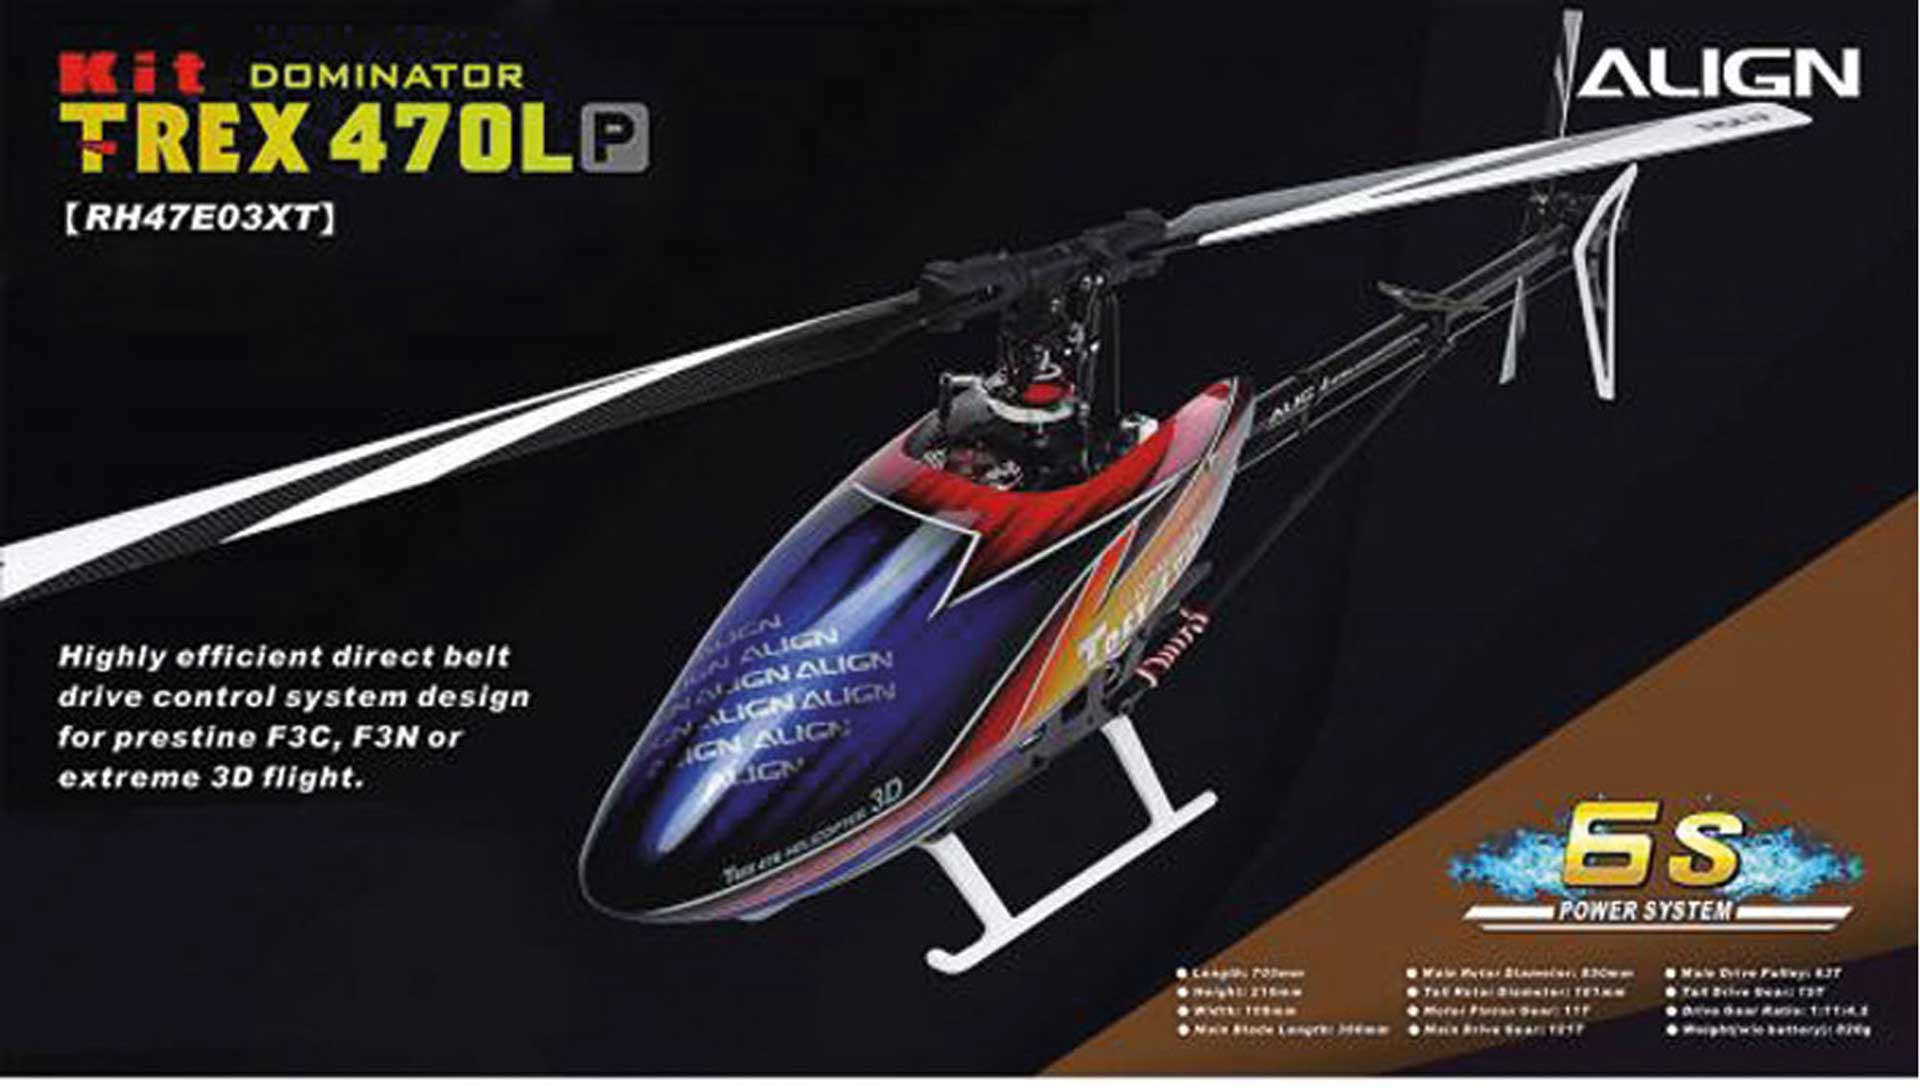 ALIGN T-REX 470LP DOMINATOR KIT Hubschrauber / Helikopter